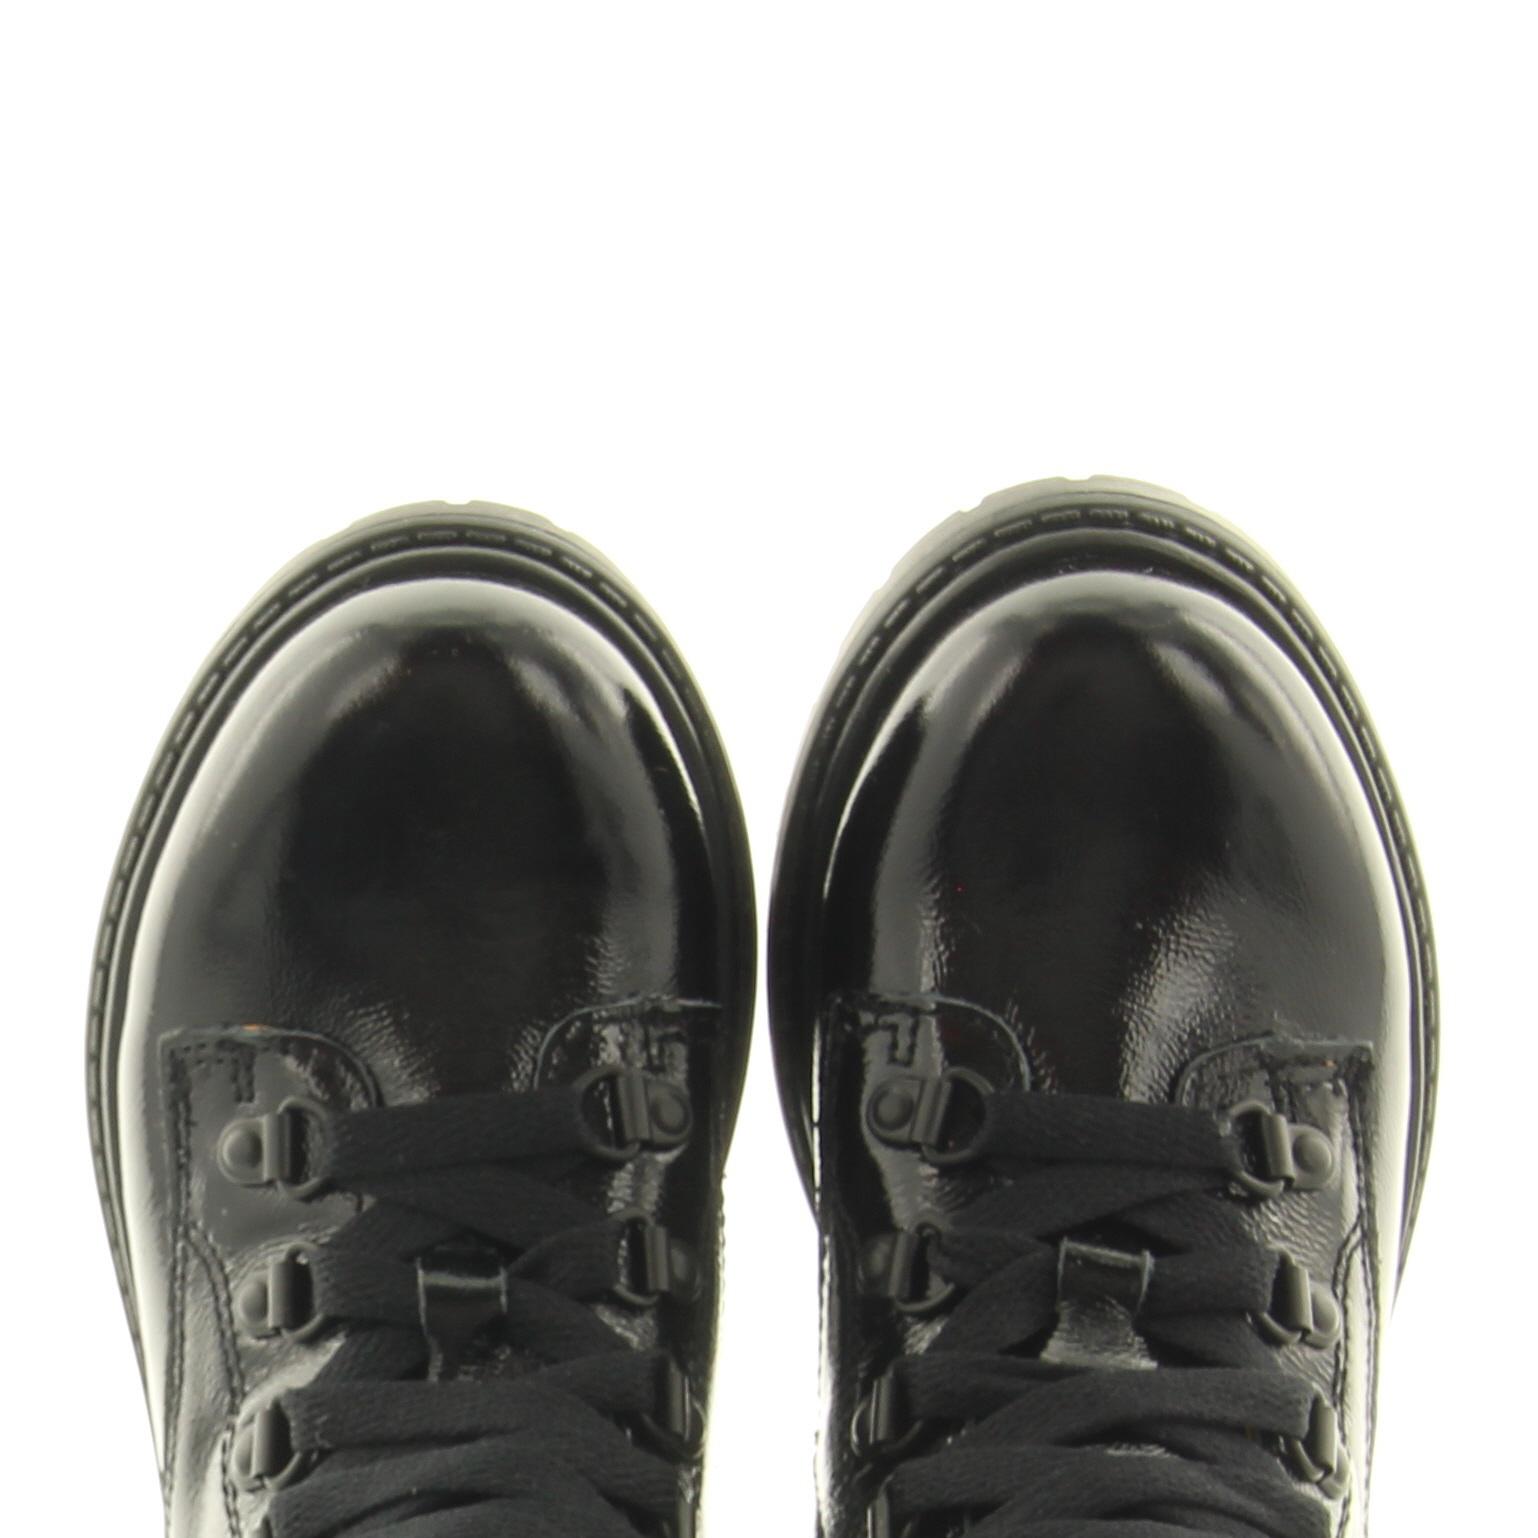 Twins Trackstyle 320510 989 Black Patent